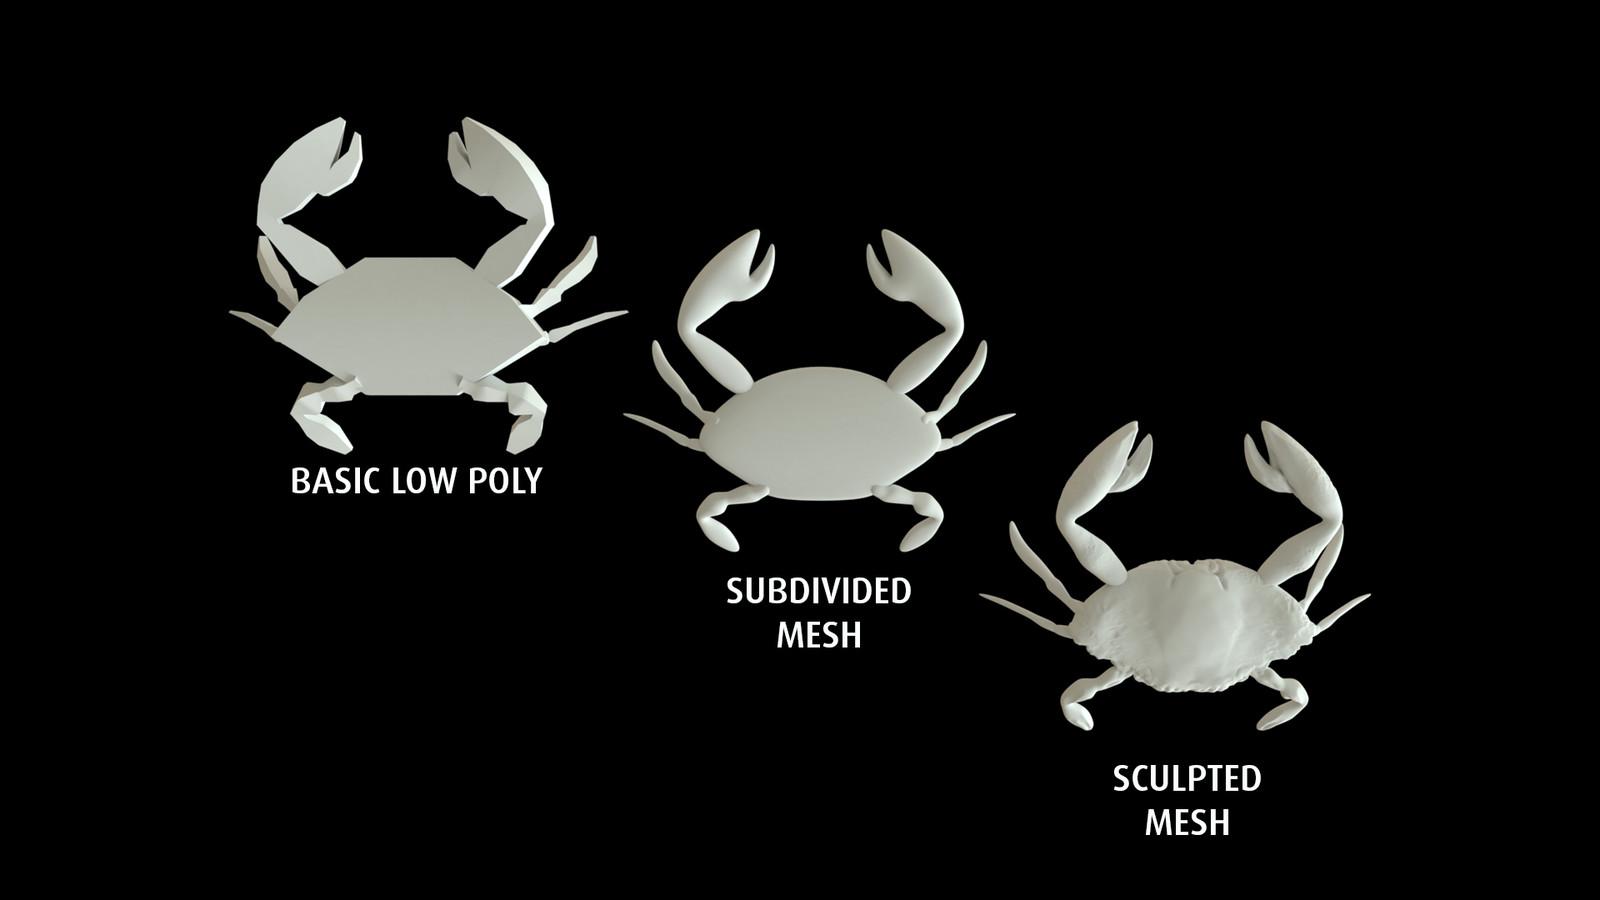 Evolution of the mesh